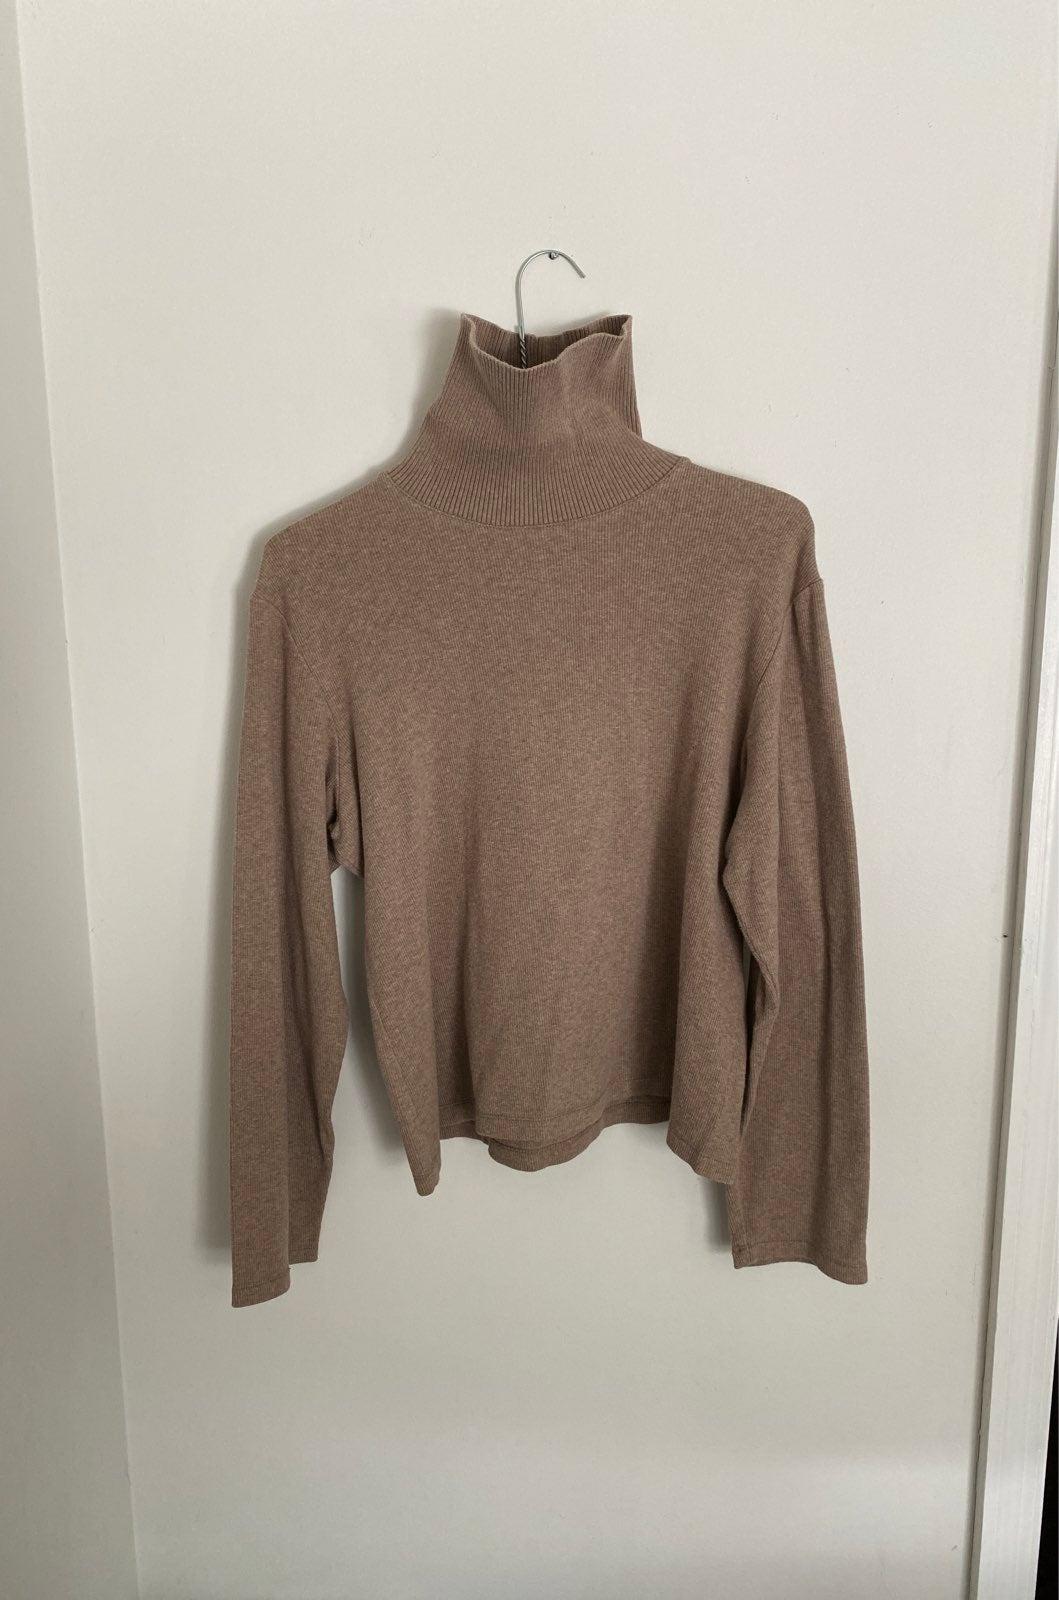 Womens turtle neck Sweater